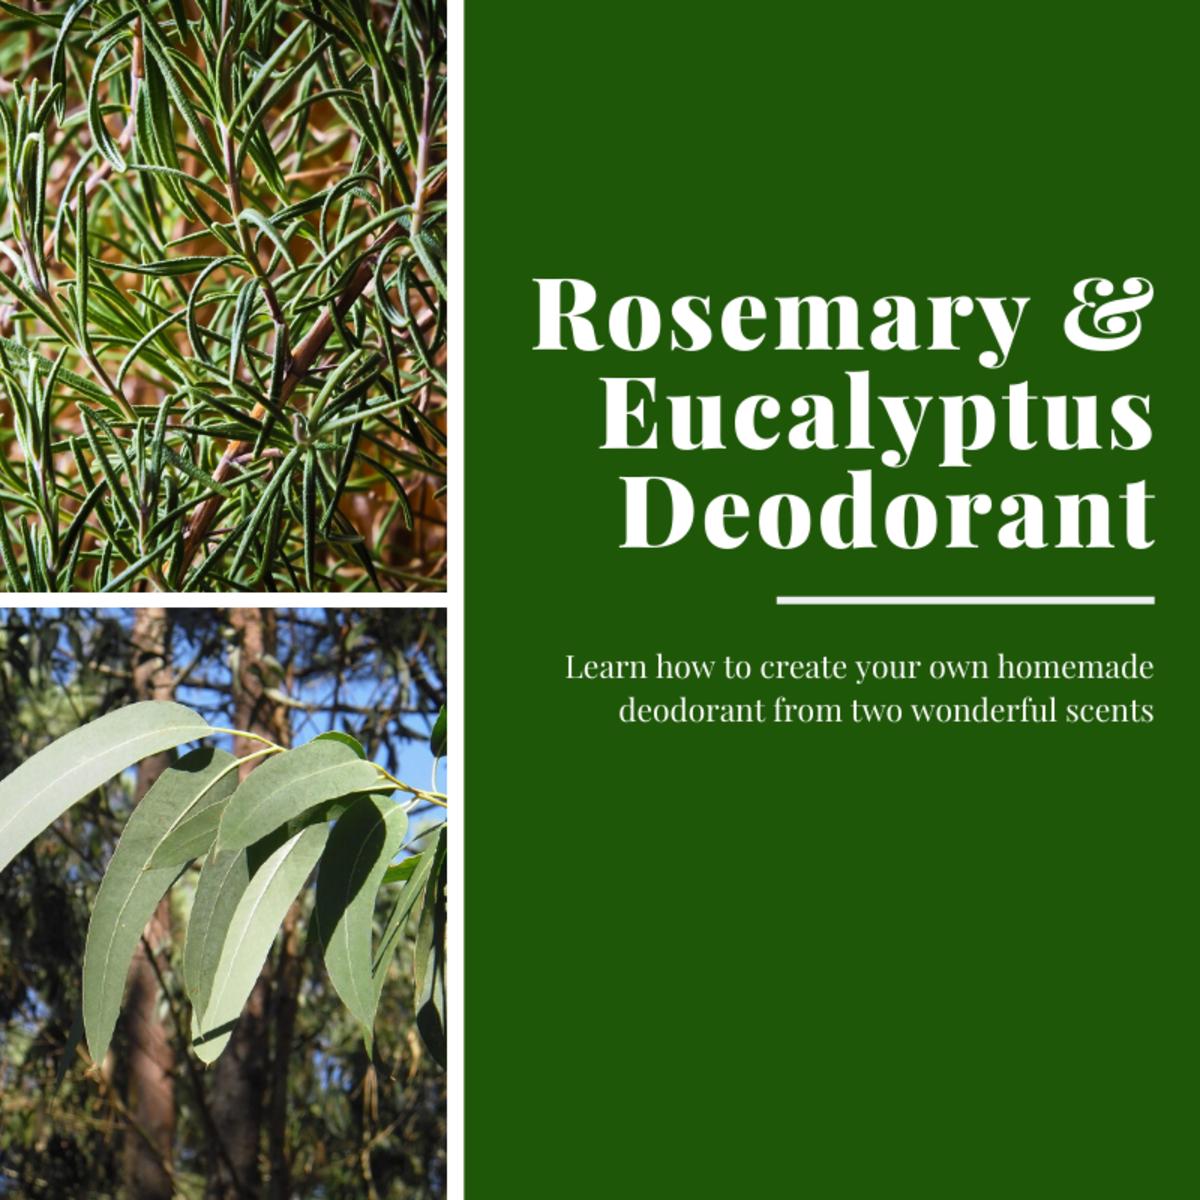 Rosemary and Eucalyptus Deodorant